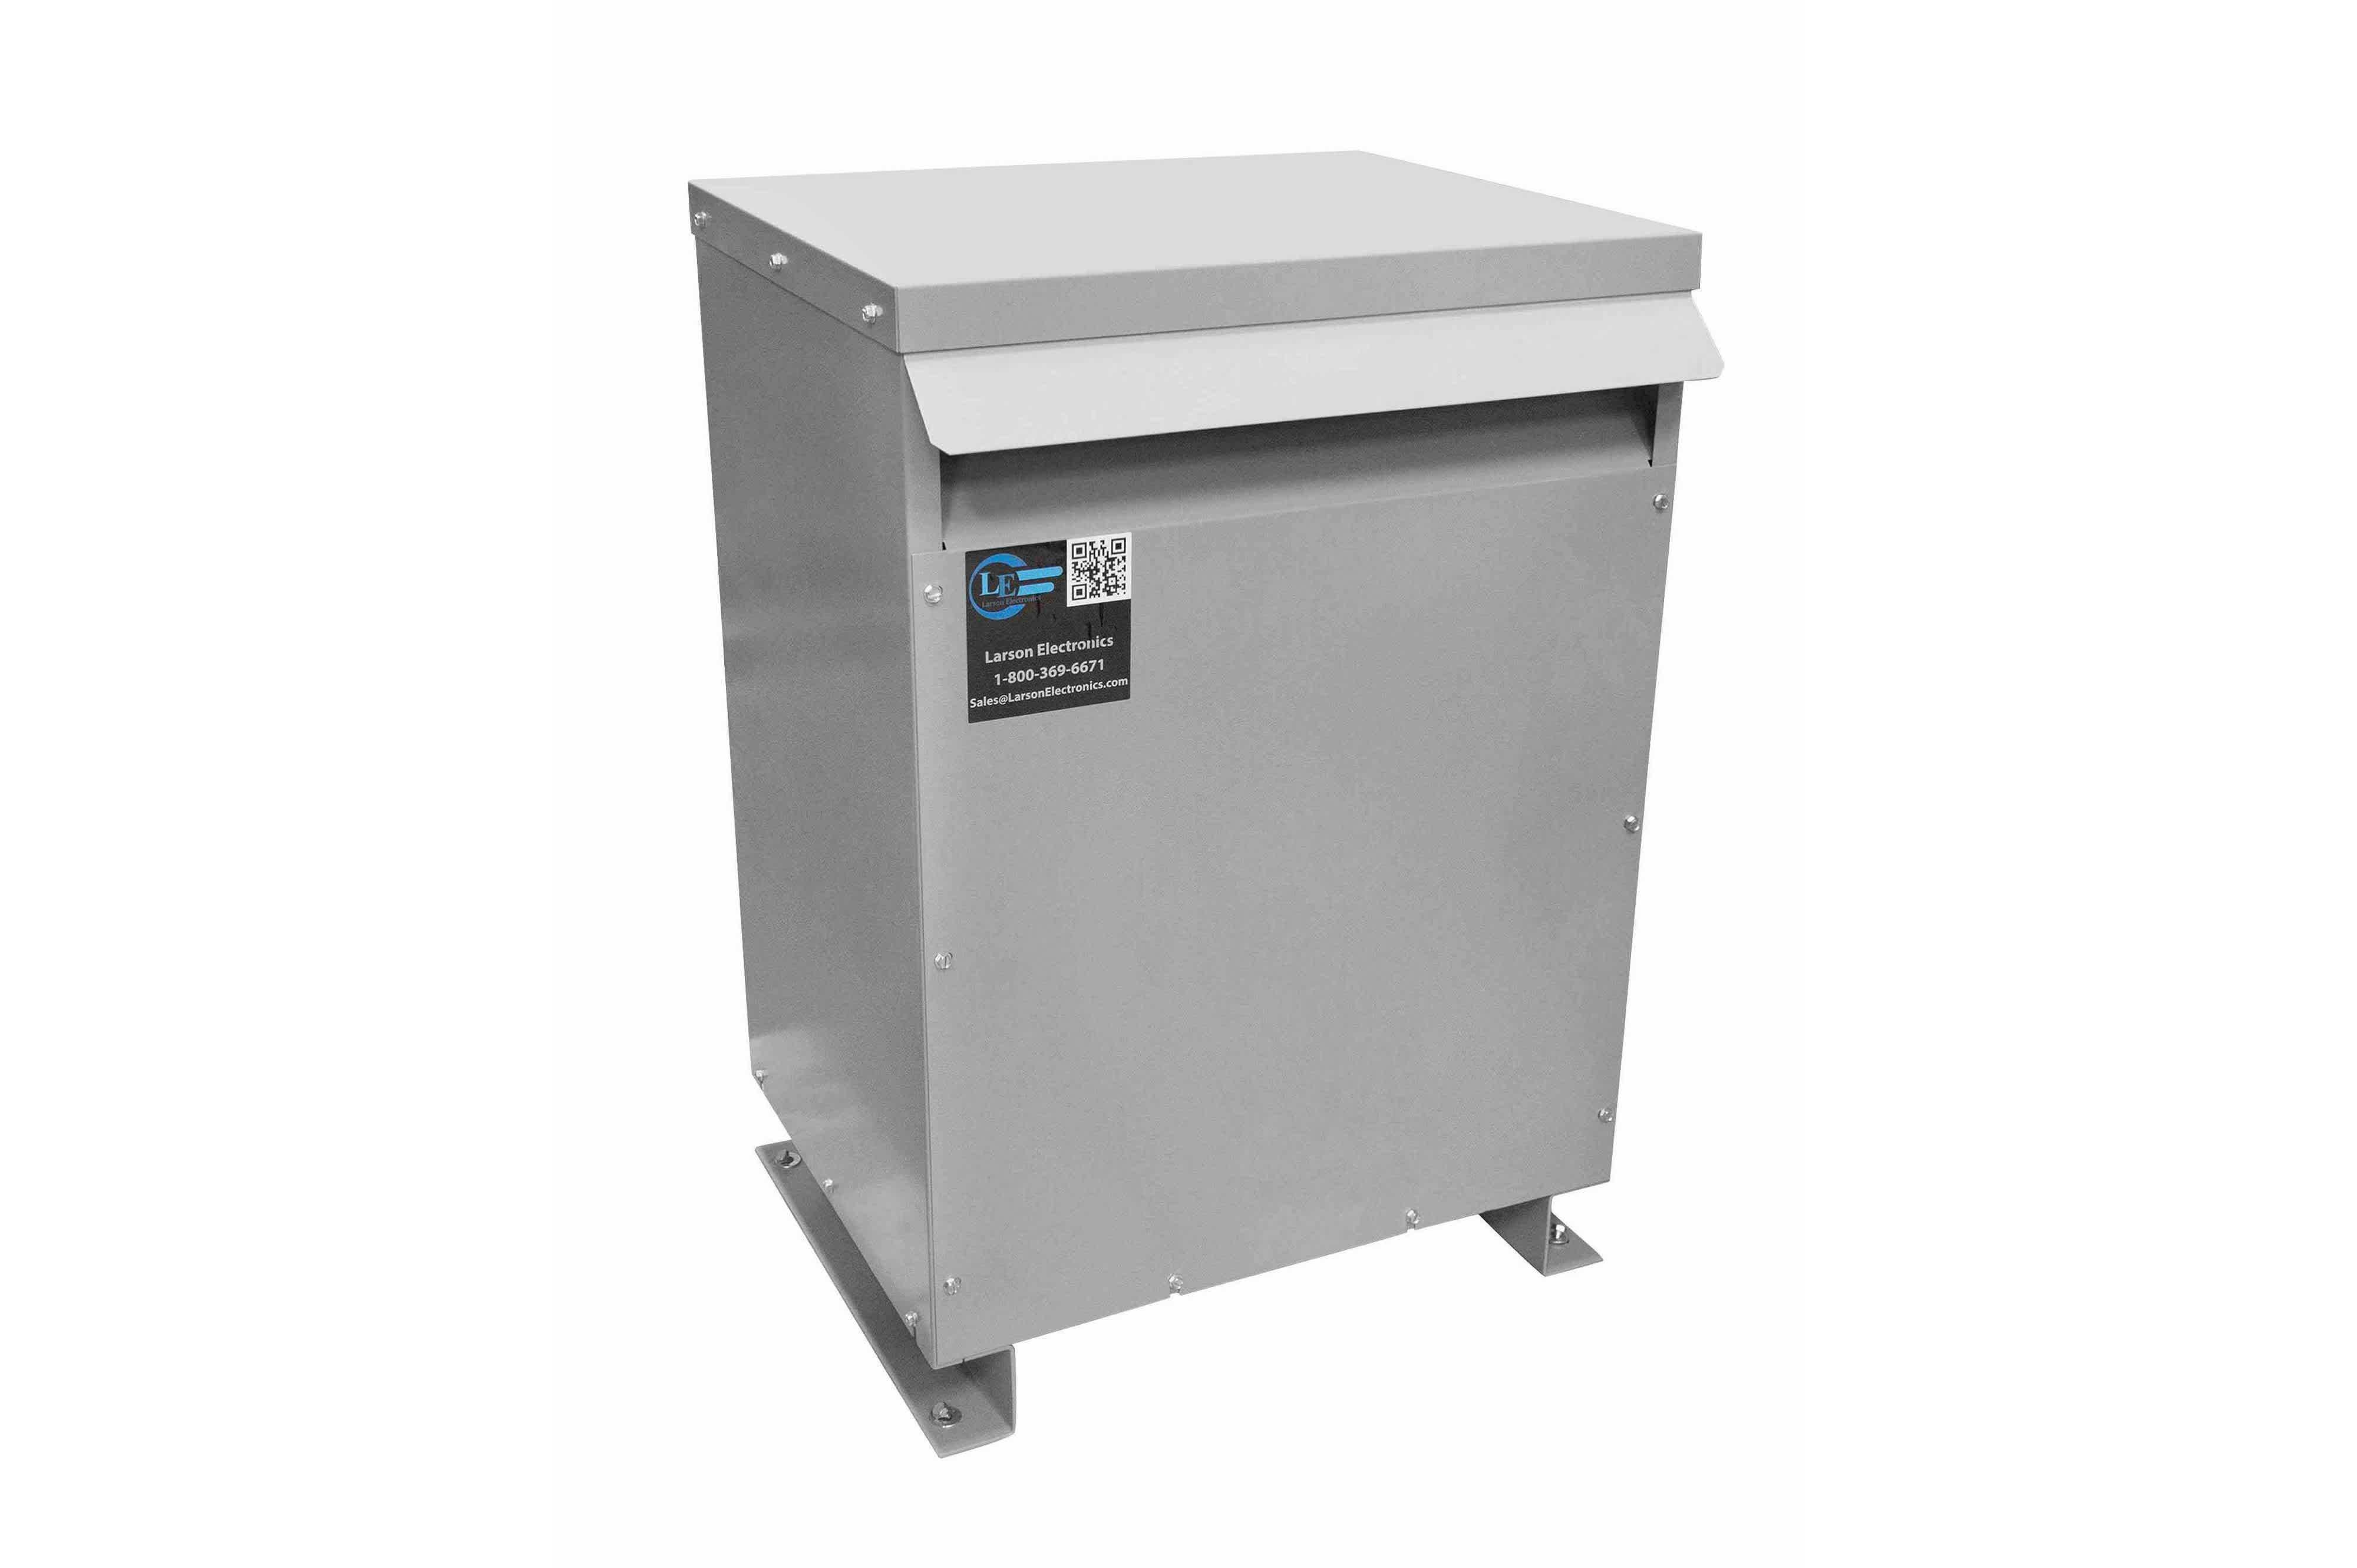 65 kVA 3PH Isolation Transformer, 600V Wye Primary, 240V/120 Delta Secondary, N3R, Ventilated, 60 Hz